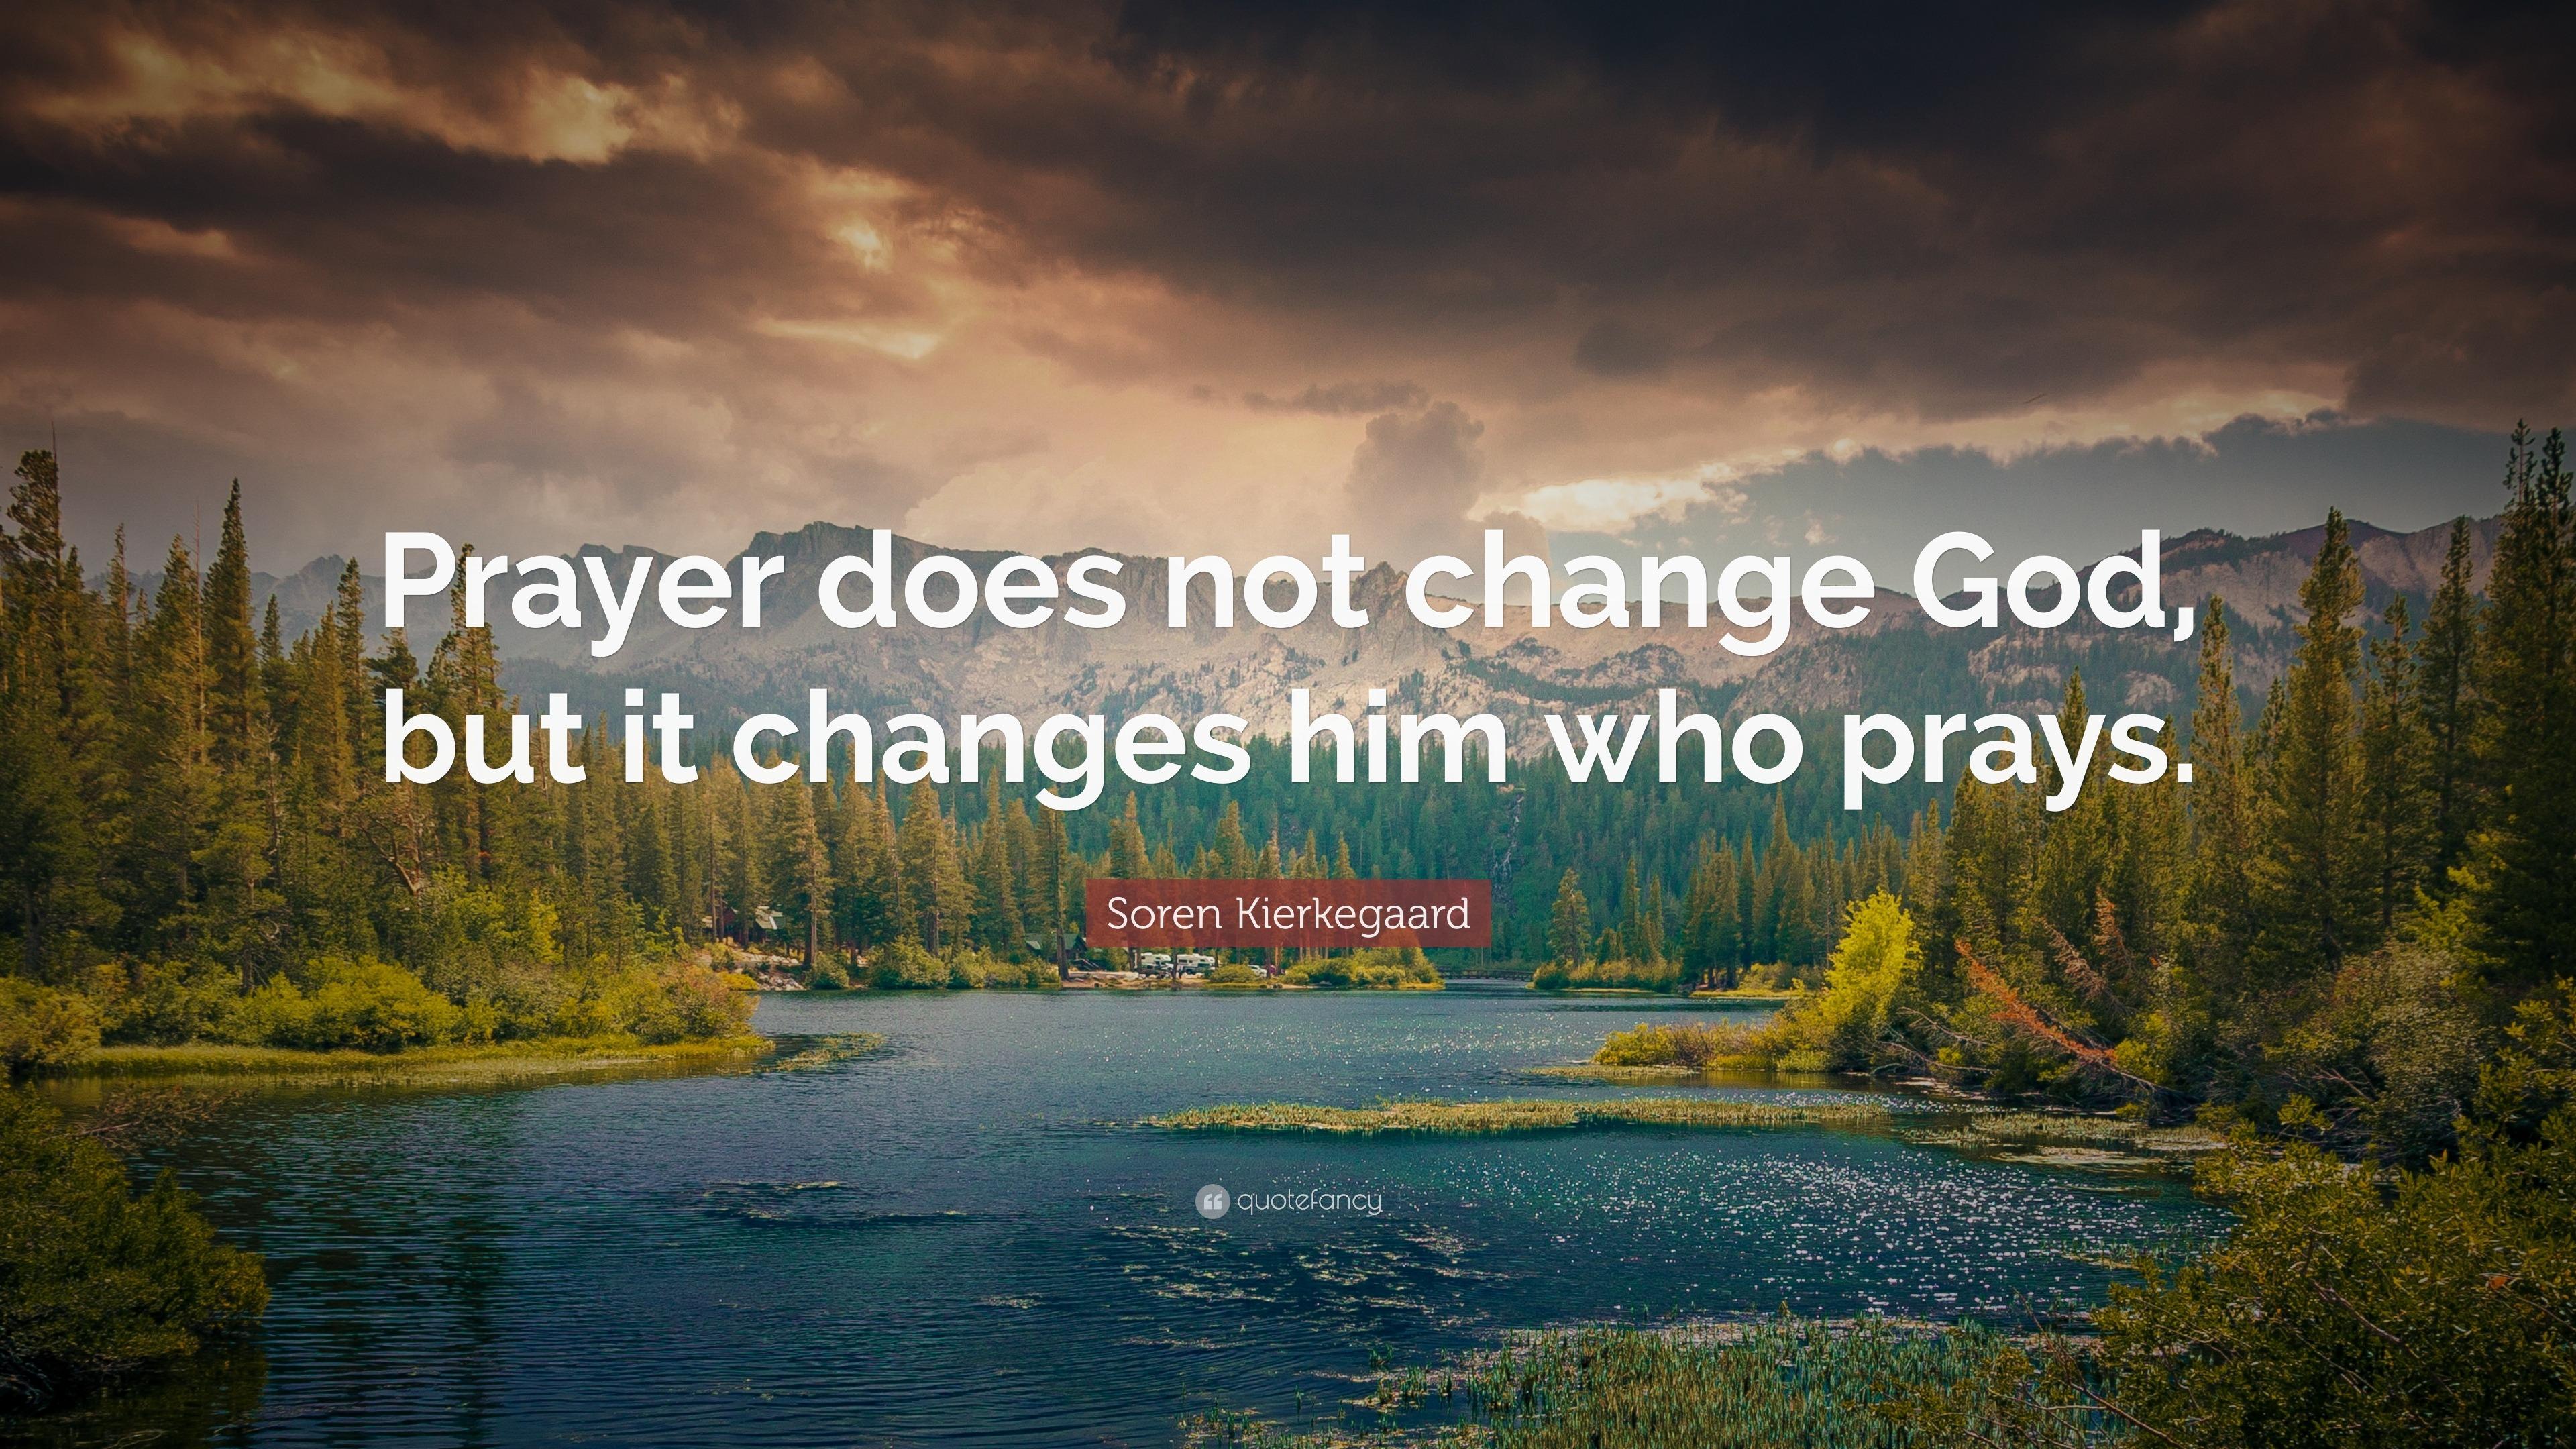 Passion Wallpaper Quote Soren Kierkegaard Quote Prayer Does Not Change God But